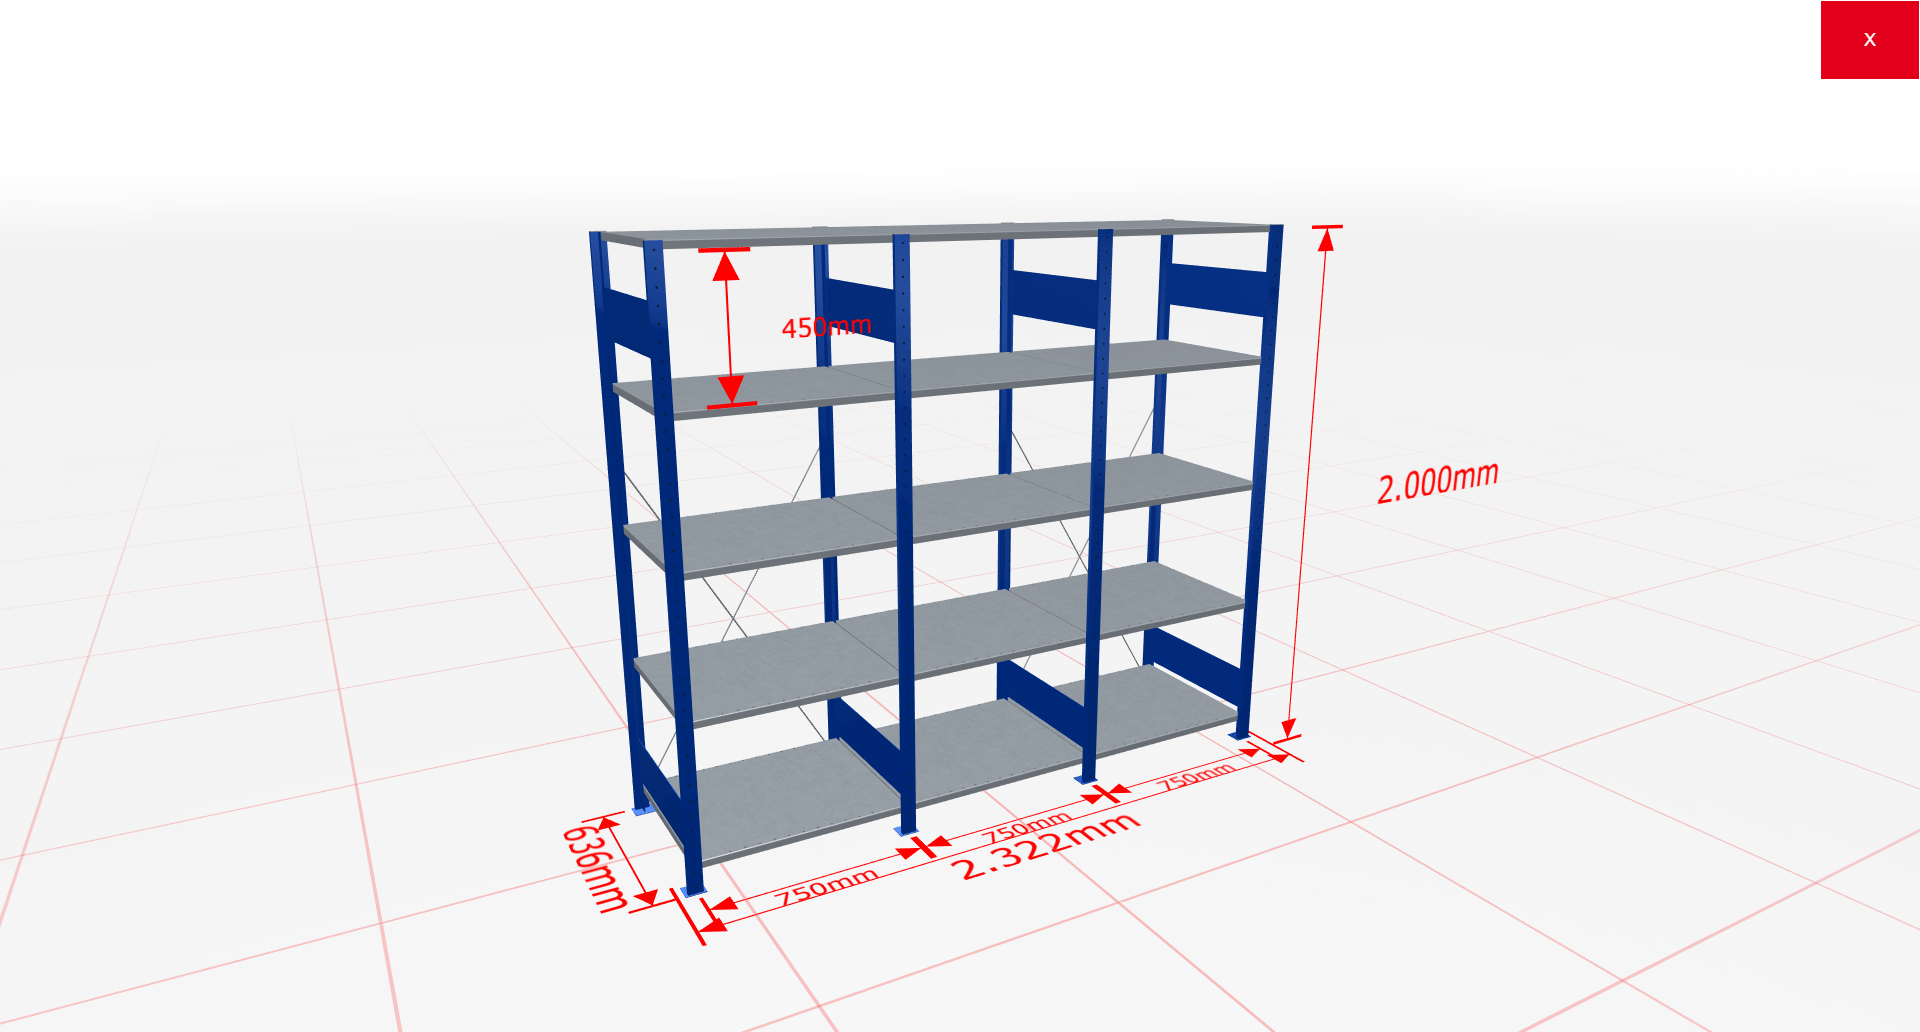 Fachbodenregal Komplettregal 2000x2322x600 mm (HxBxT) SCHULTE Lagertechnik blau 5 Ebenen  150 kg je Boden